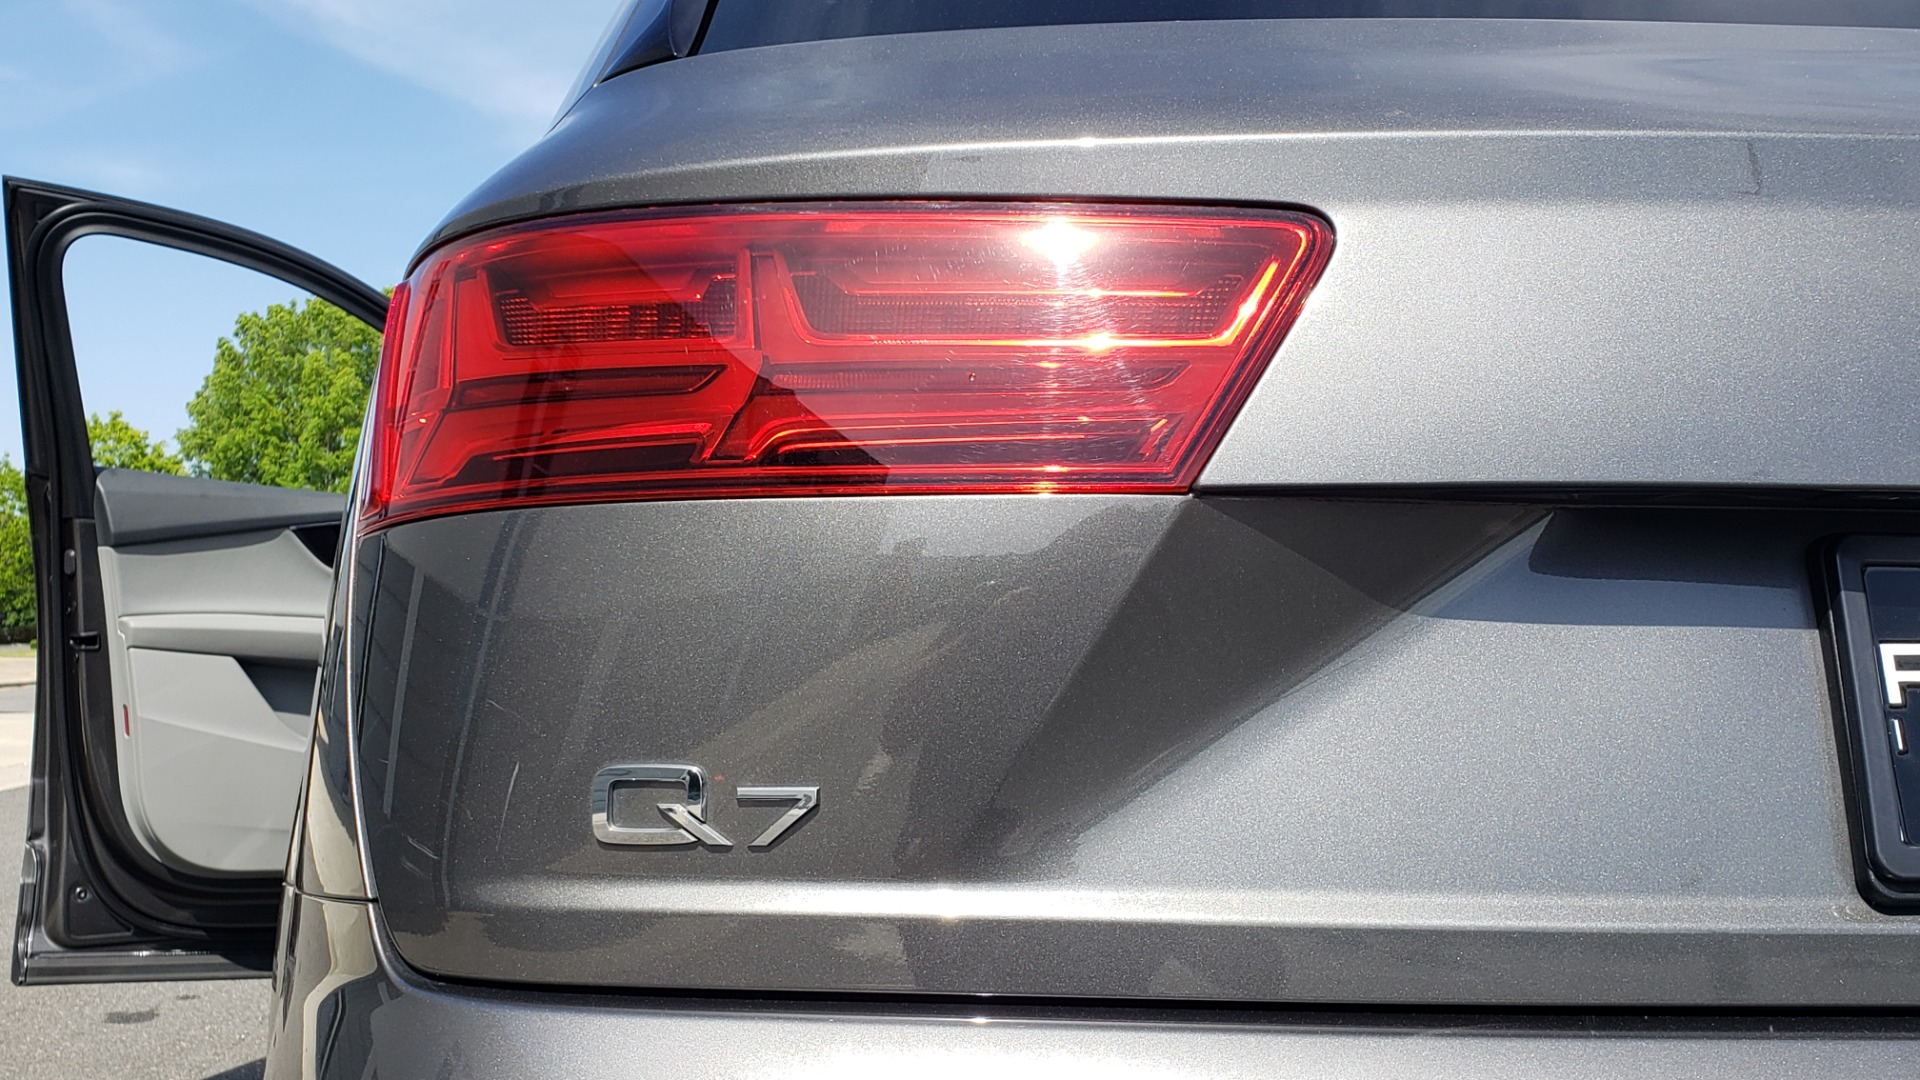 Used 2018 Audi Q7 PRESTIGE TIPTRONIC / NAV / SUNROOF / ADAPTIVE PKG / DRVR ASST / CLD WTHR /  for sale $49,995 at Formula Imports in Charlotte NC 28227 27